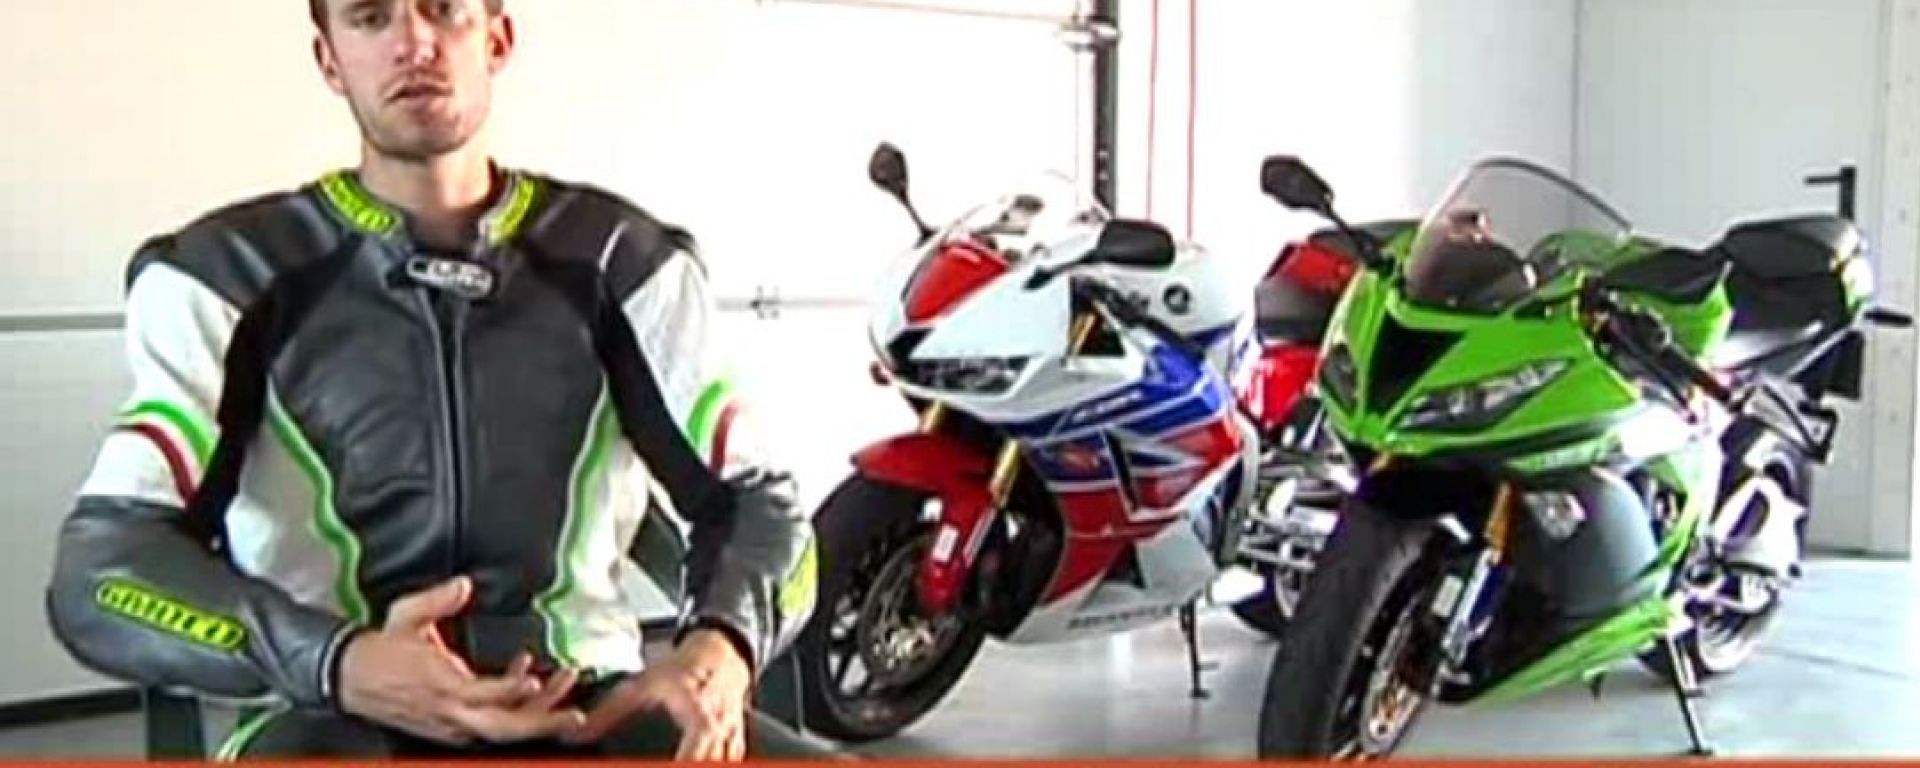 Honda CBR 600 RR vs Kawasaki Ninja ZX-6R 636